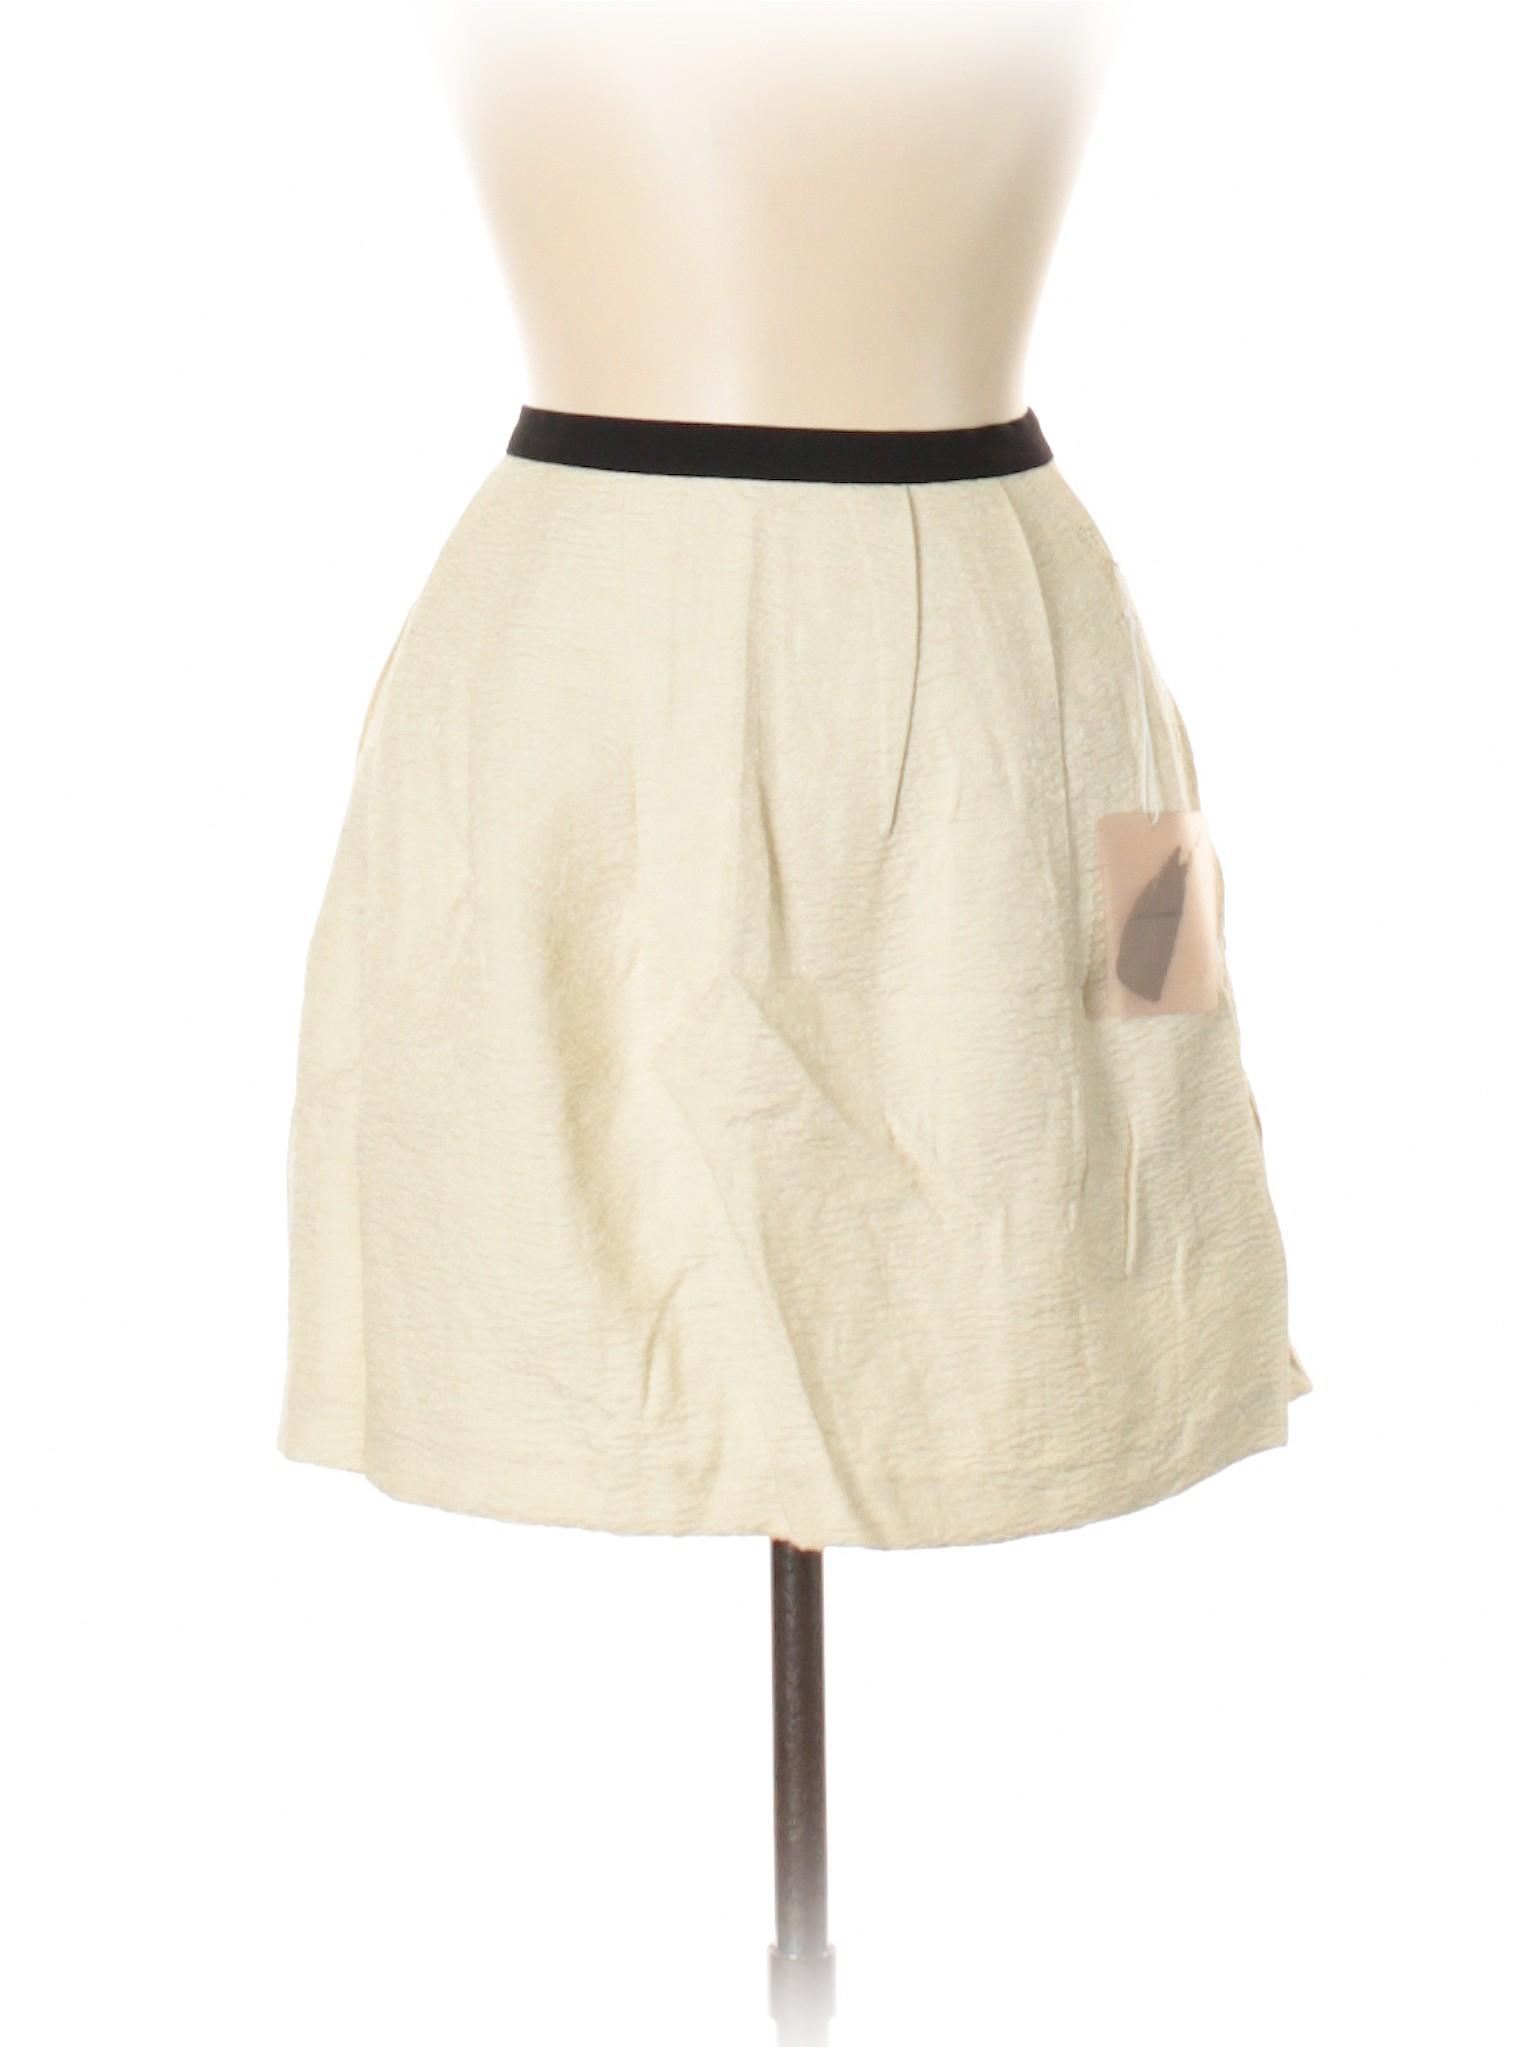 21 Skirt winter Casual Leisure Forever nfqIXxE